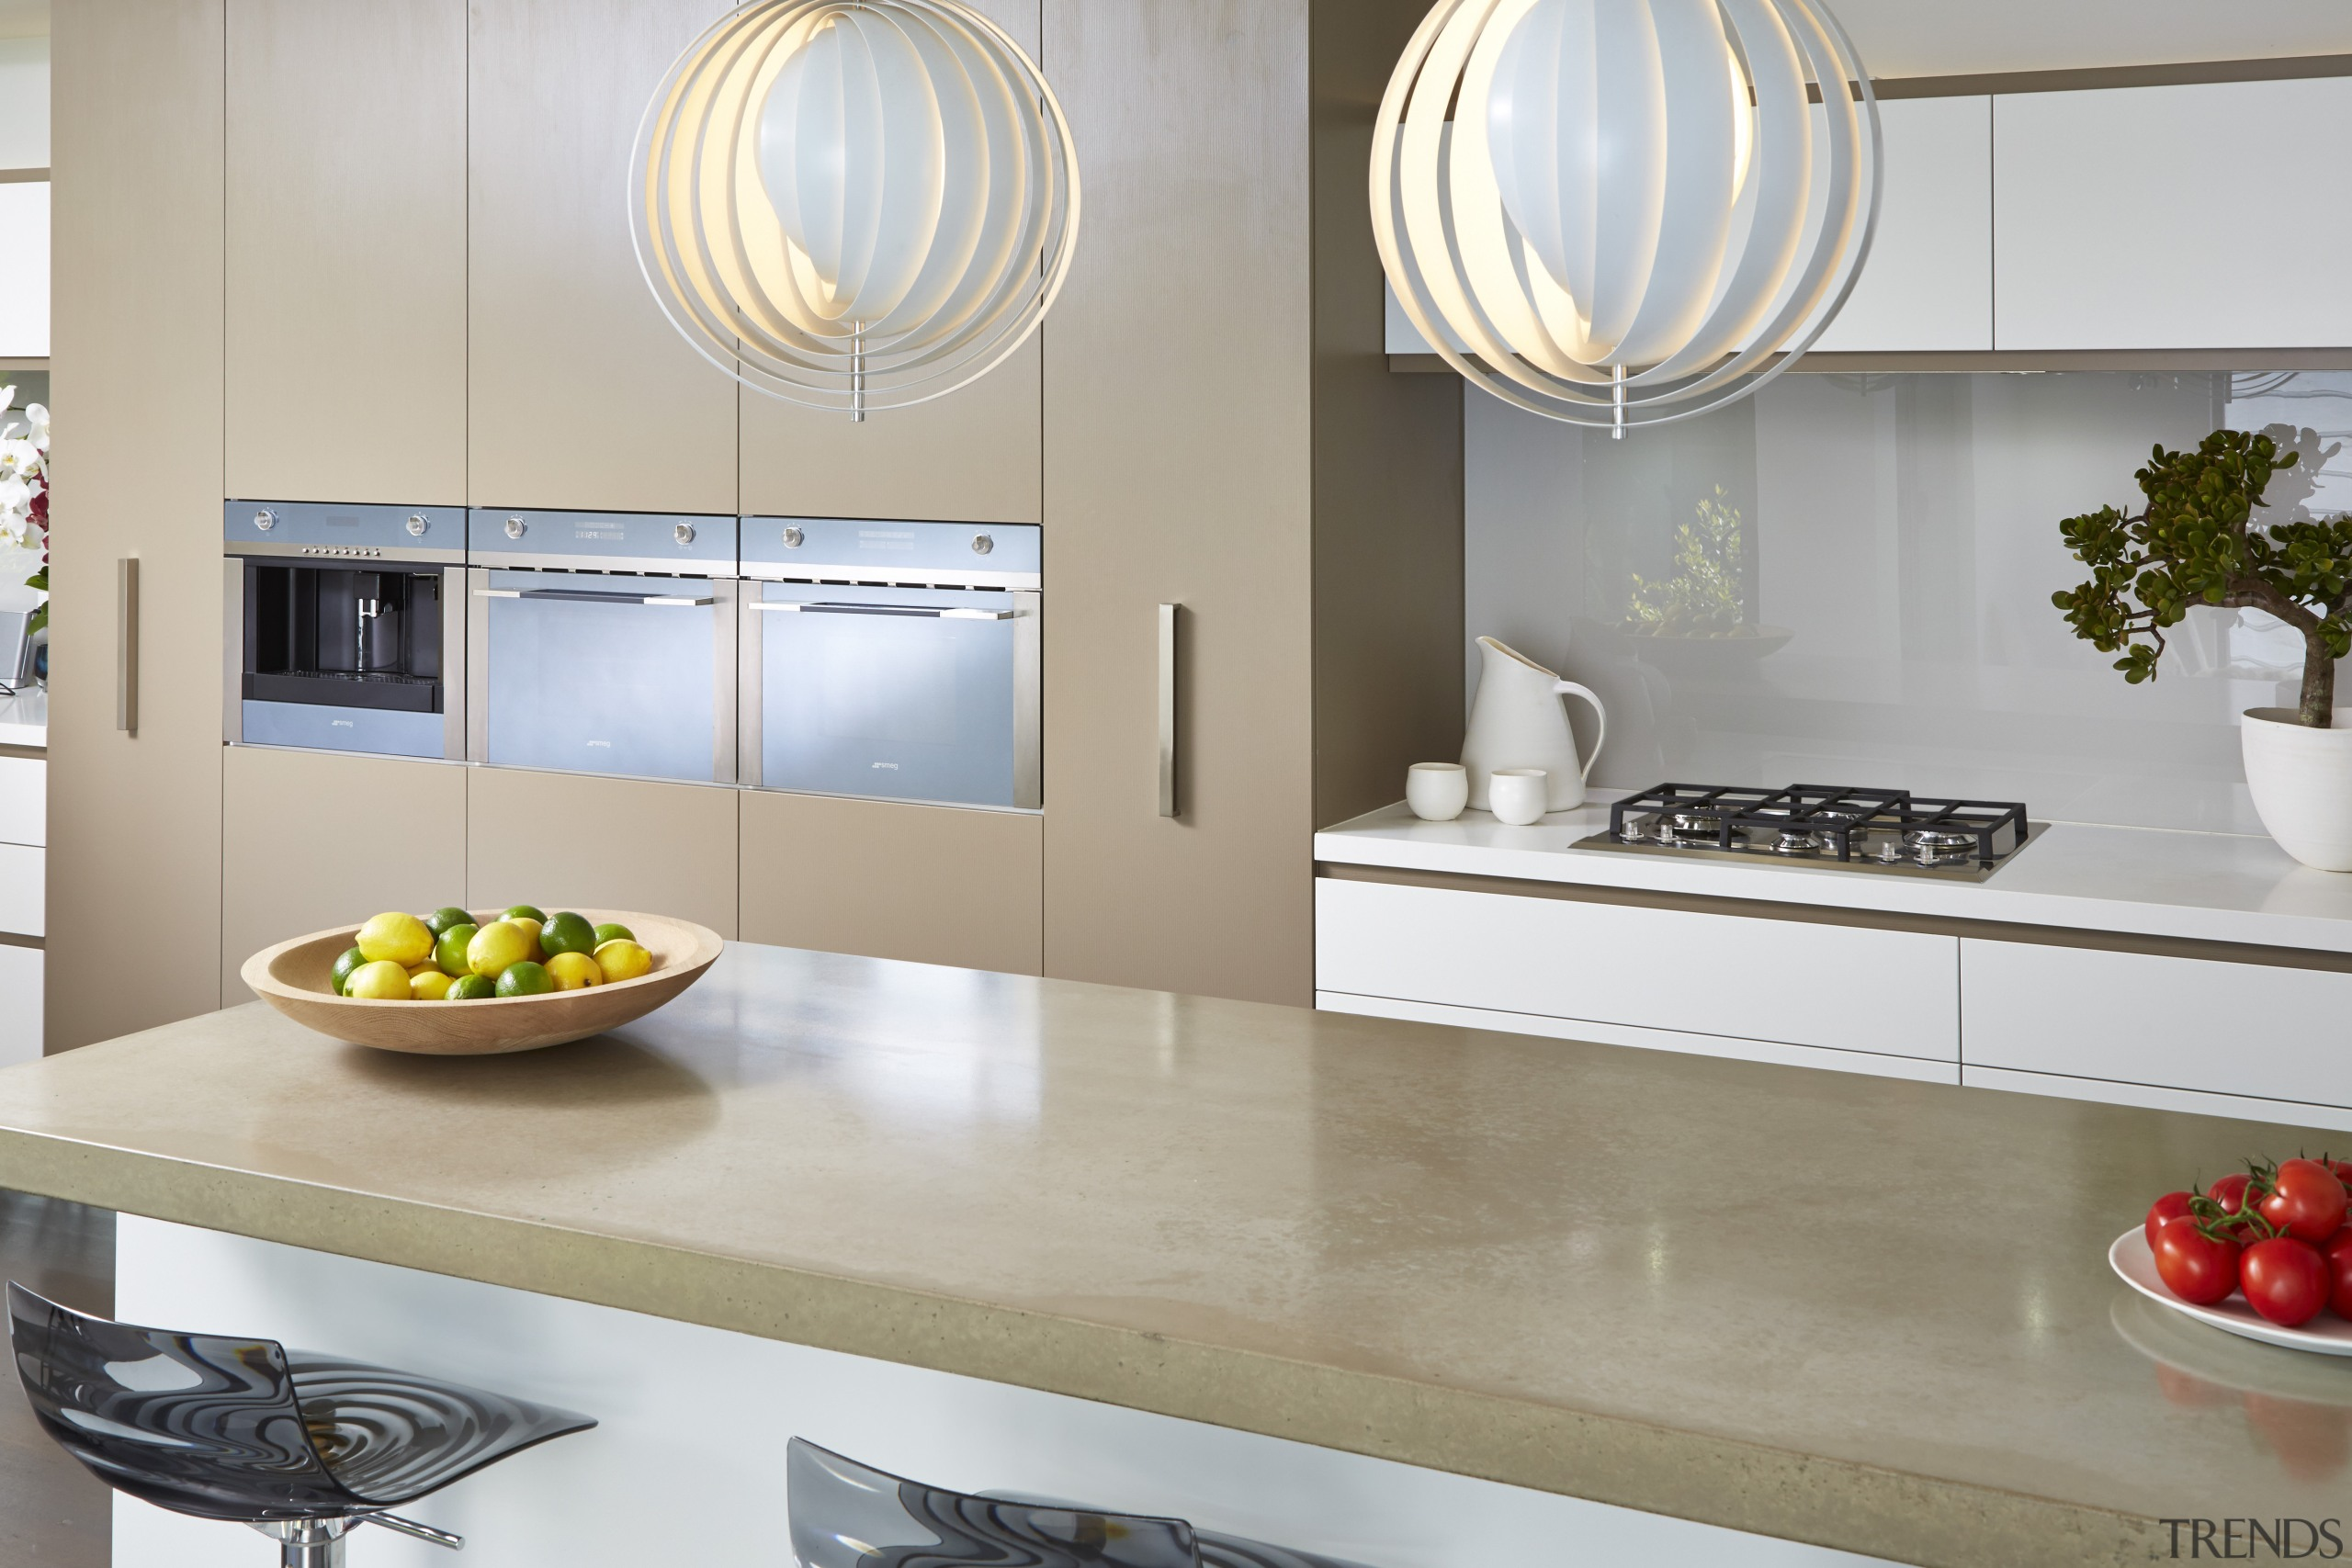 Cavanough also chose a Smeg induction cooktop for countertop, home appliance, interior design, kitchen, product design, gray, white